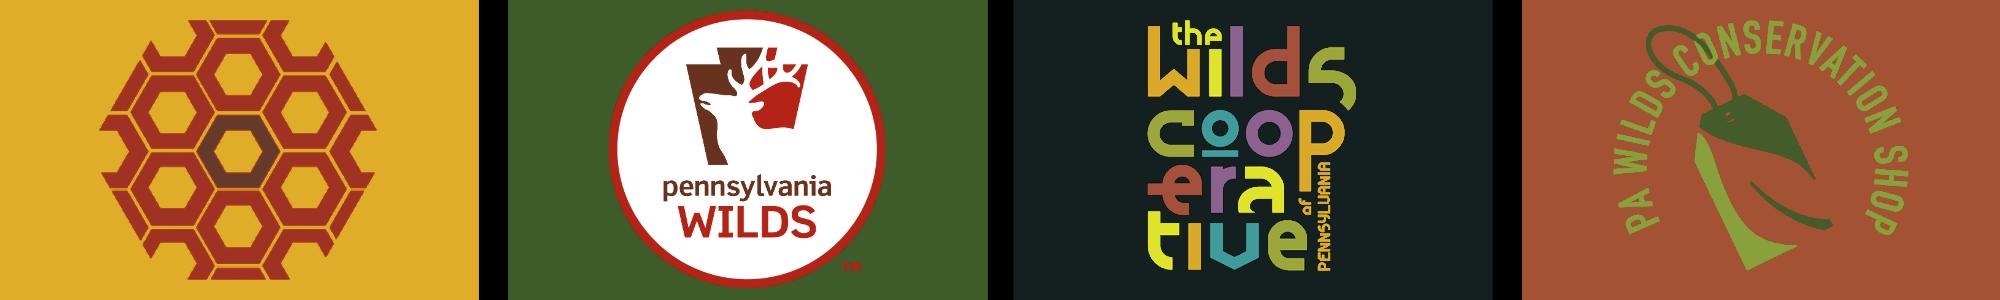 pa-wilds-center-program-logos